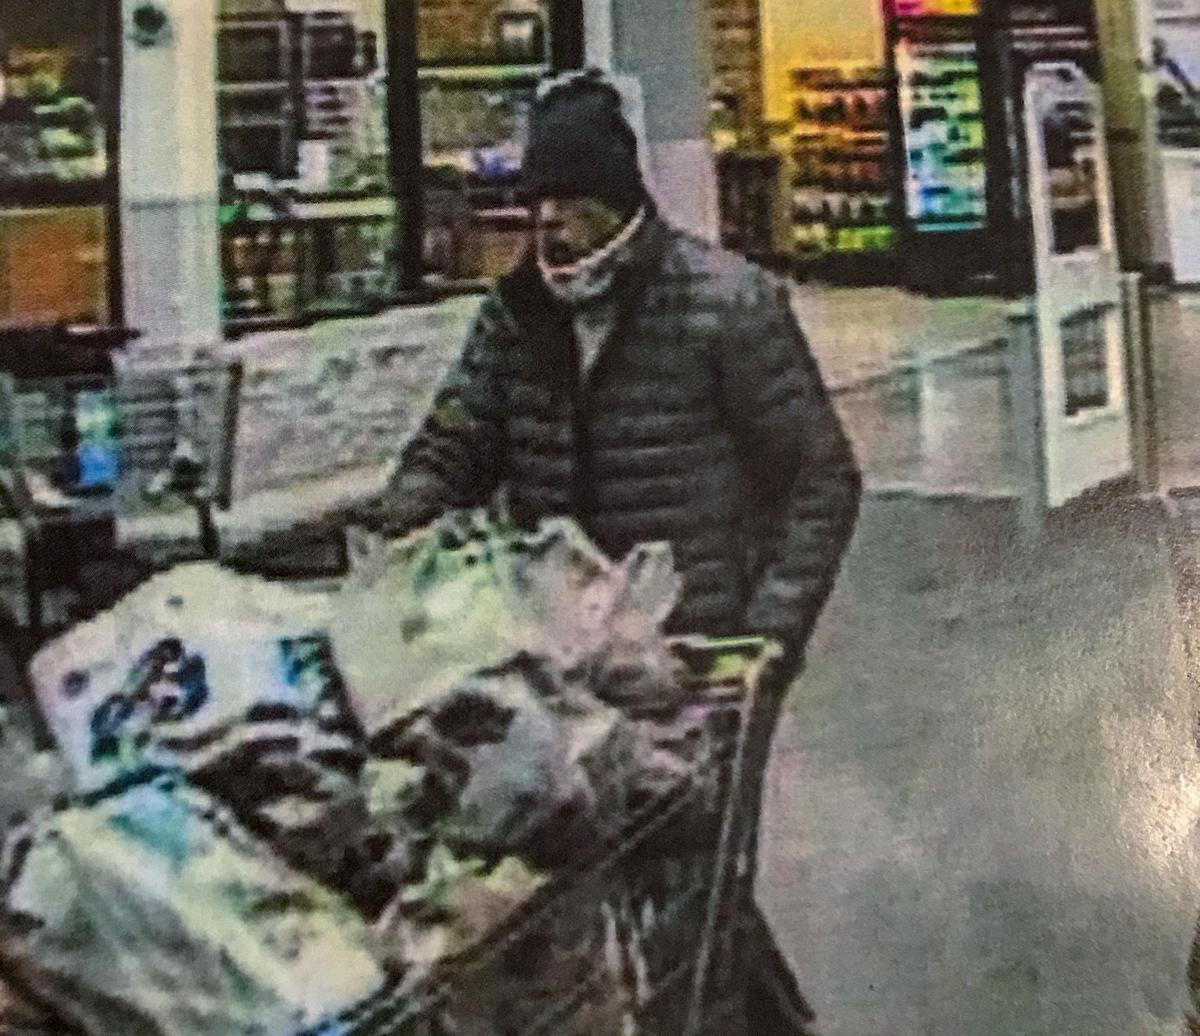 010920 POL theft suspect WPD.jpg